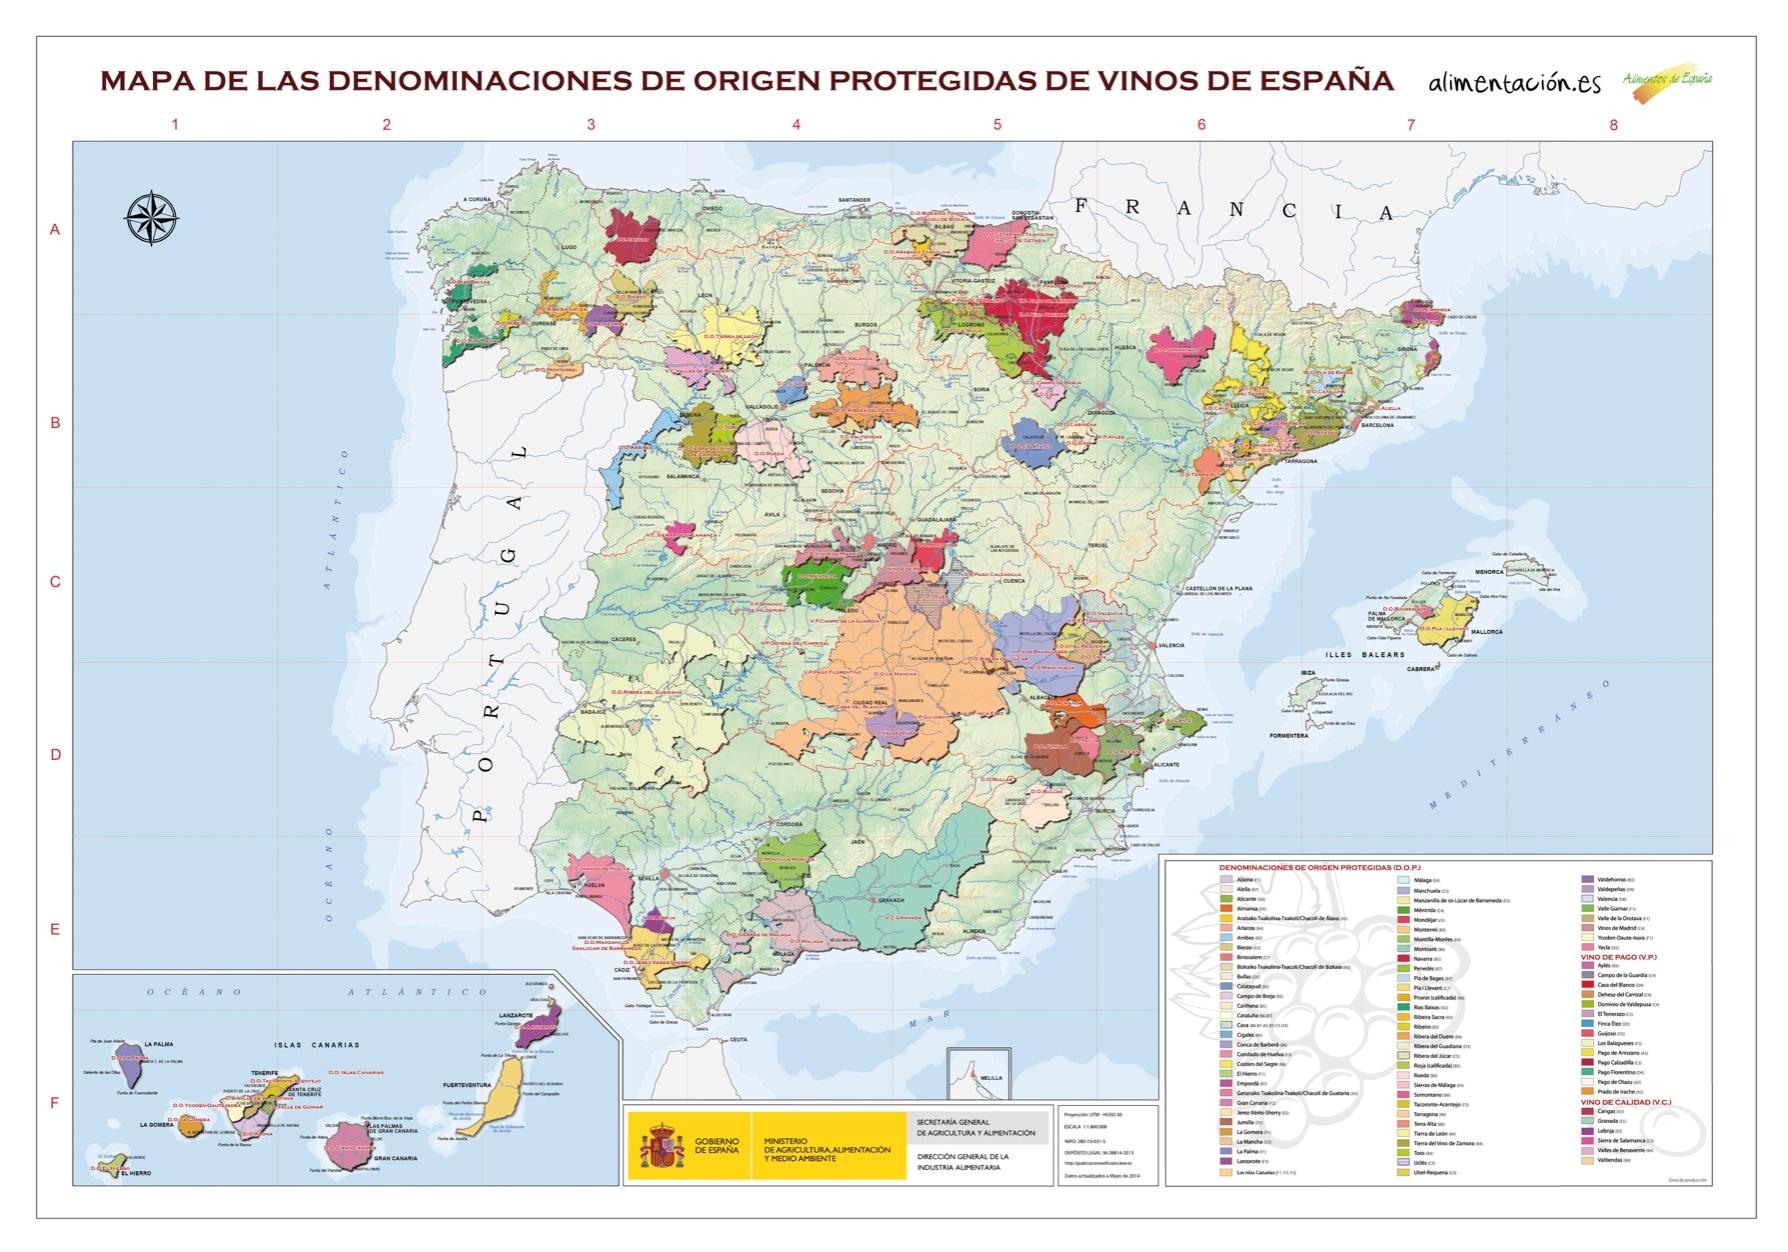 hispaania veinipiirkonnad